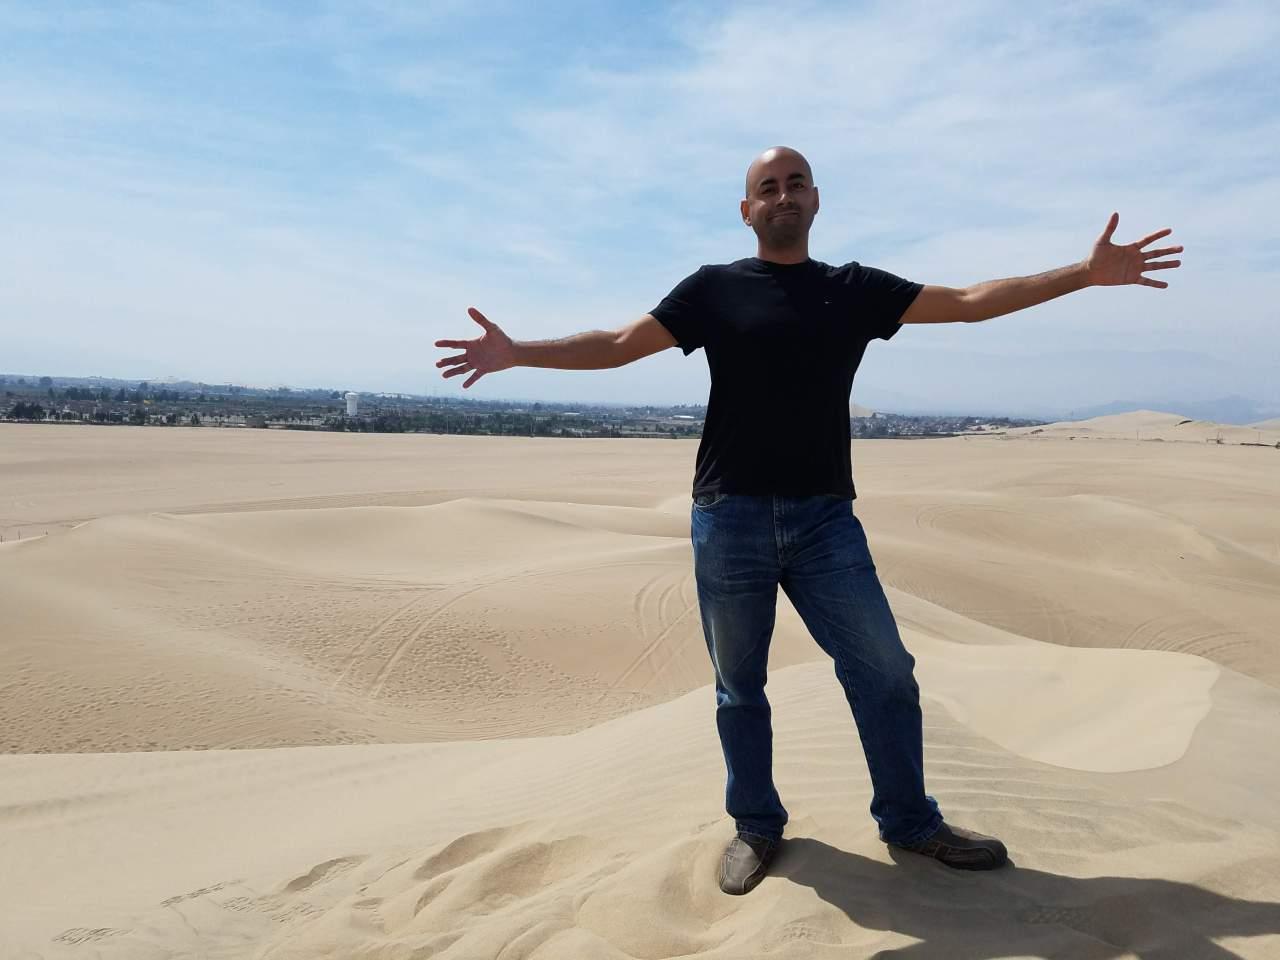 Paracas: Líneas de Nazca, Oasis de Huacachina, HaciendaTacama